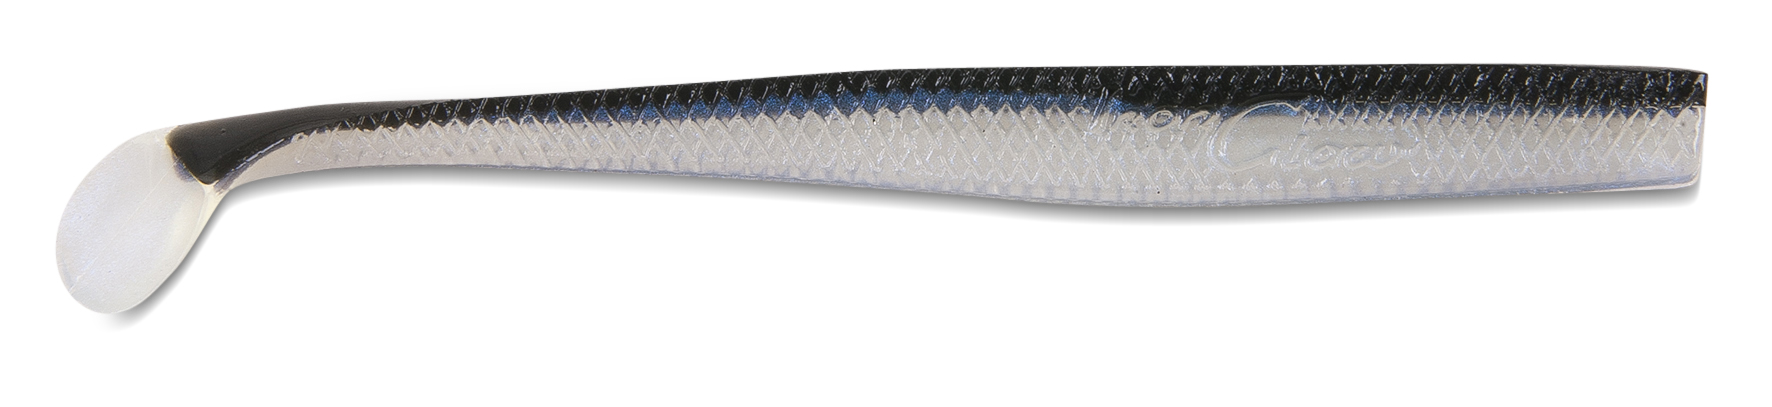 Iron Claw gumová nástraha Skinny Jake 11cm Vzor HR, 3ks